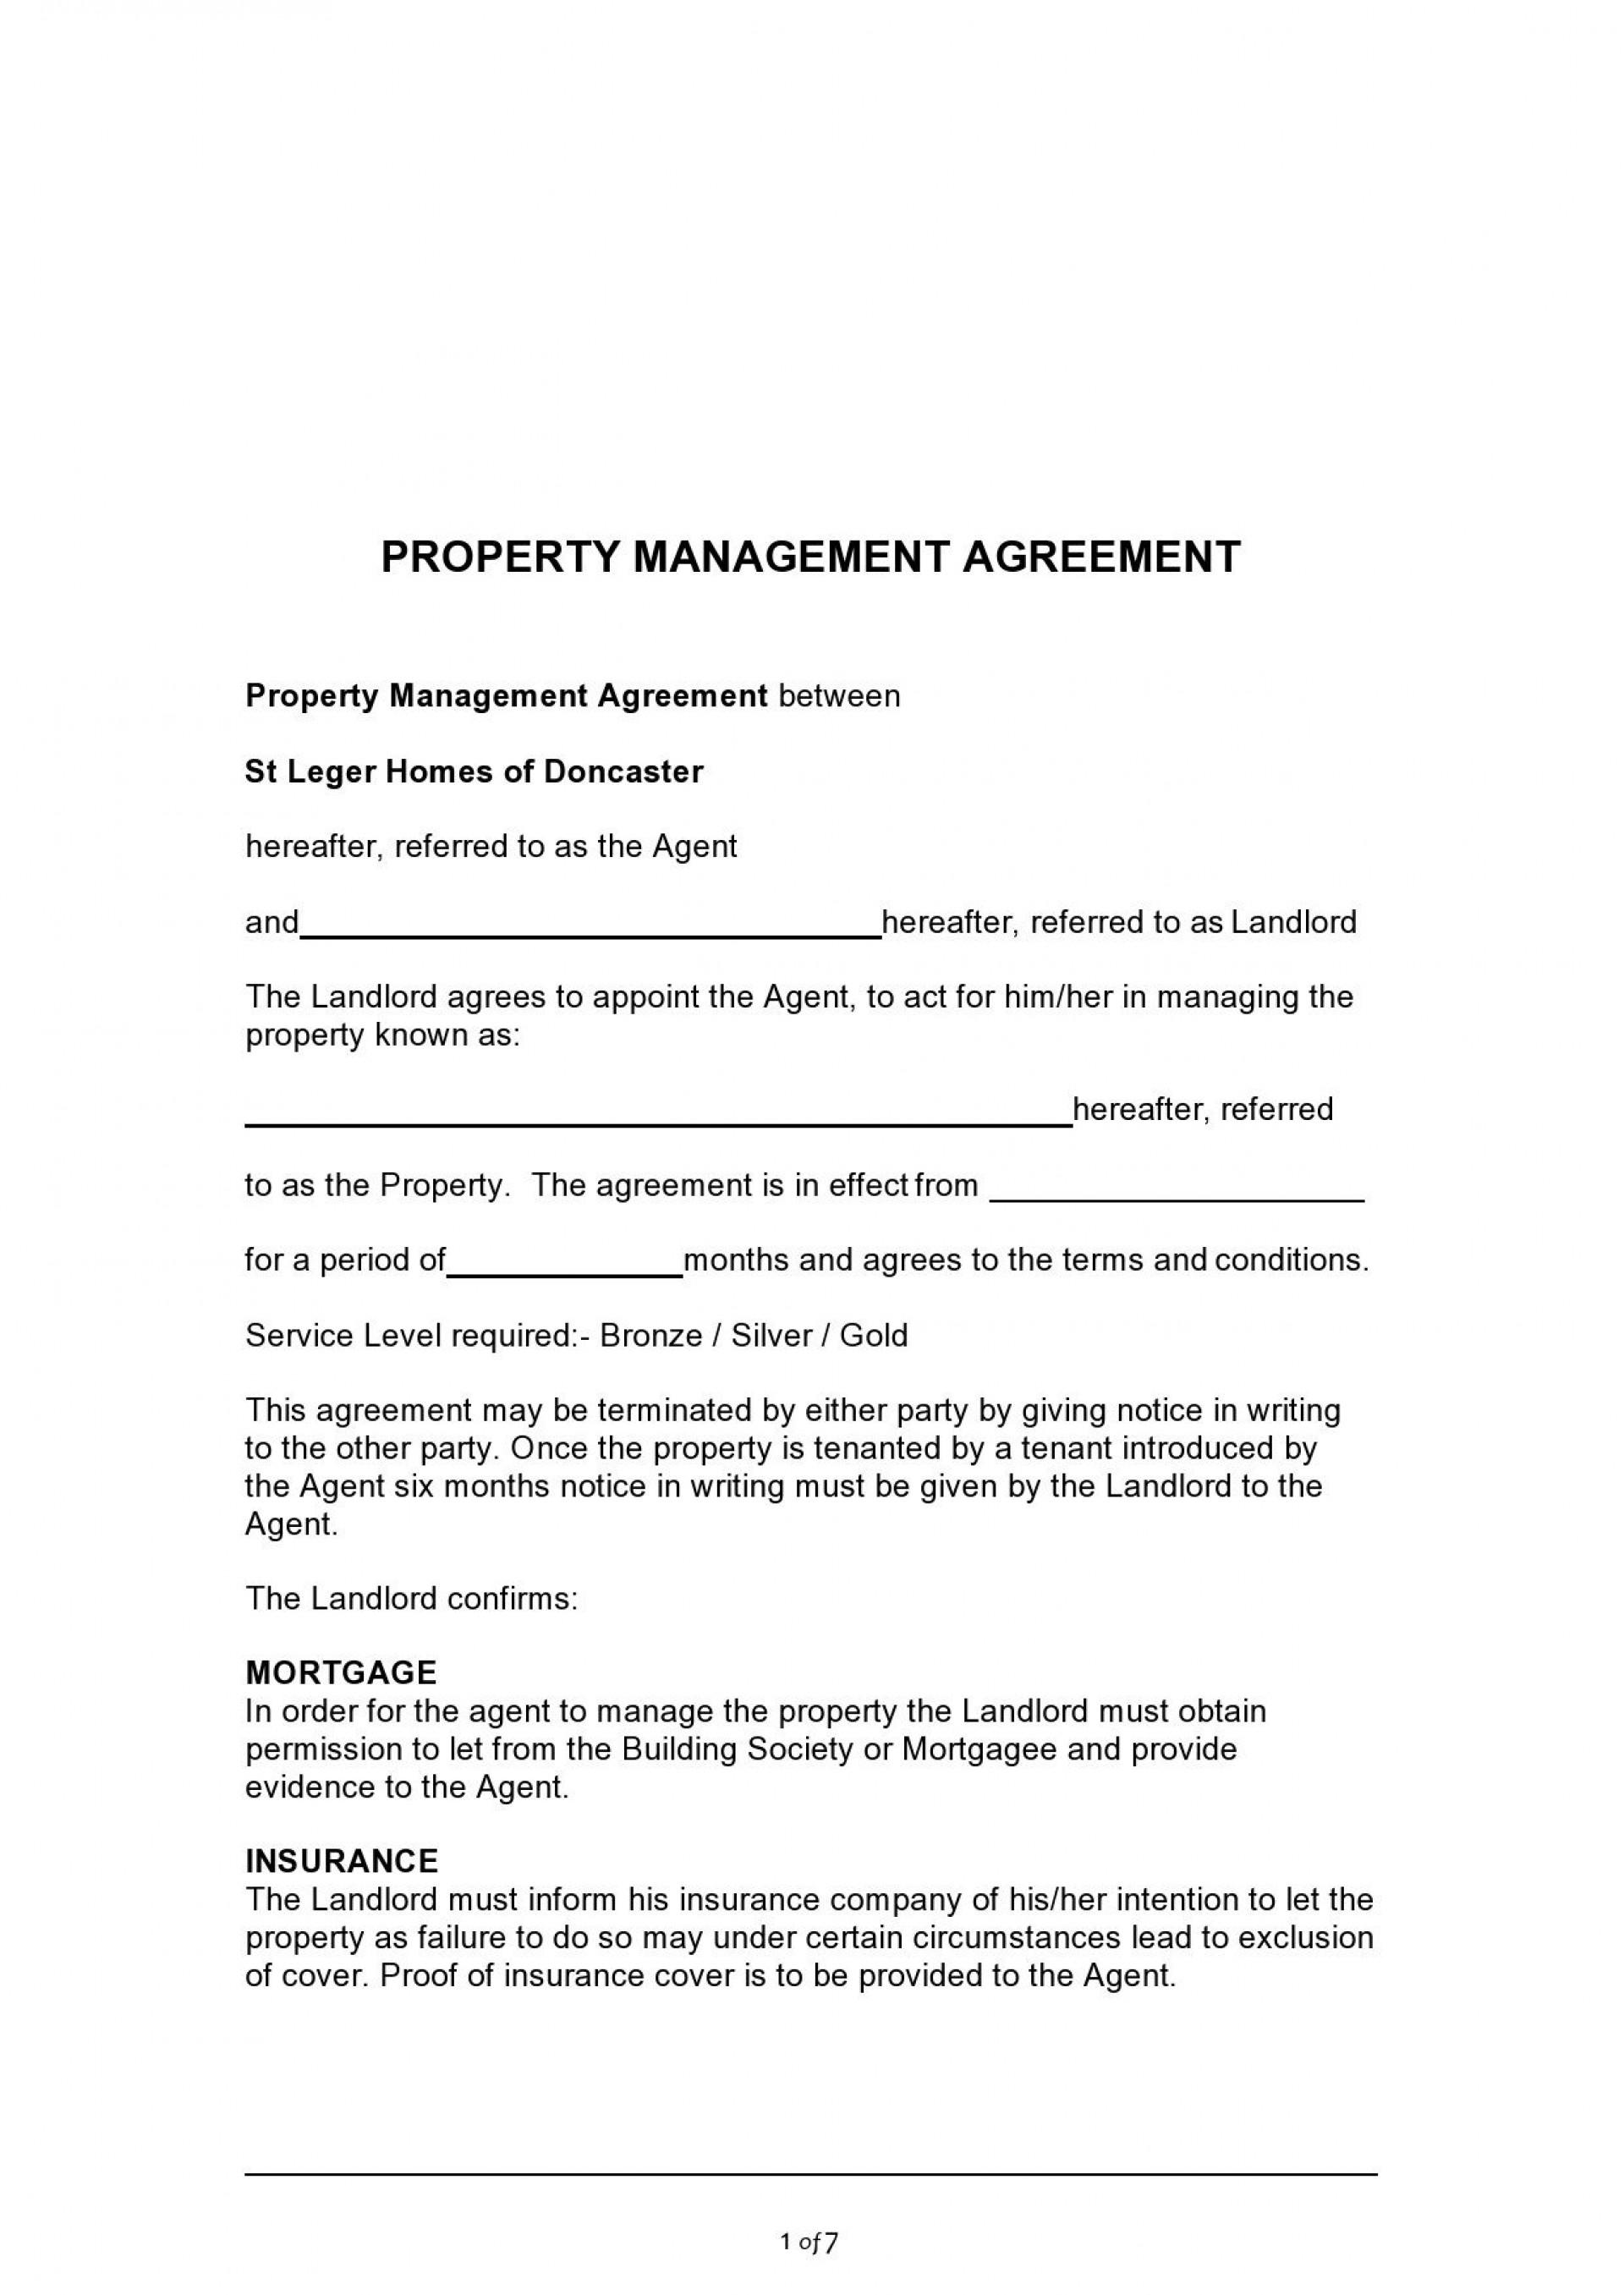 003 Impressive Commercial Property Management Agreement Template Uk Inspiration 1920